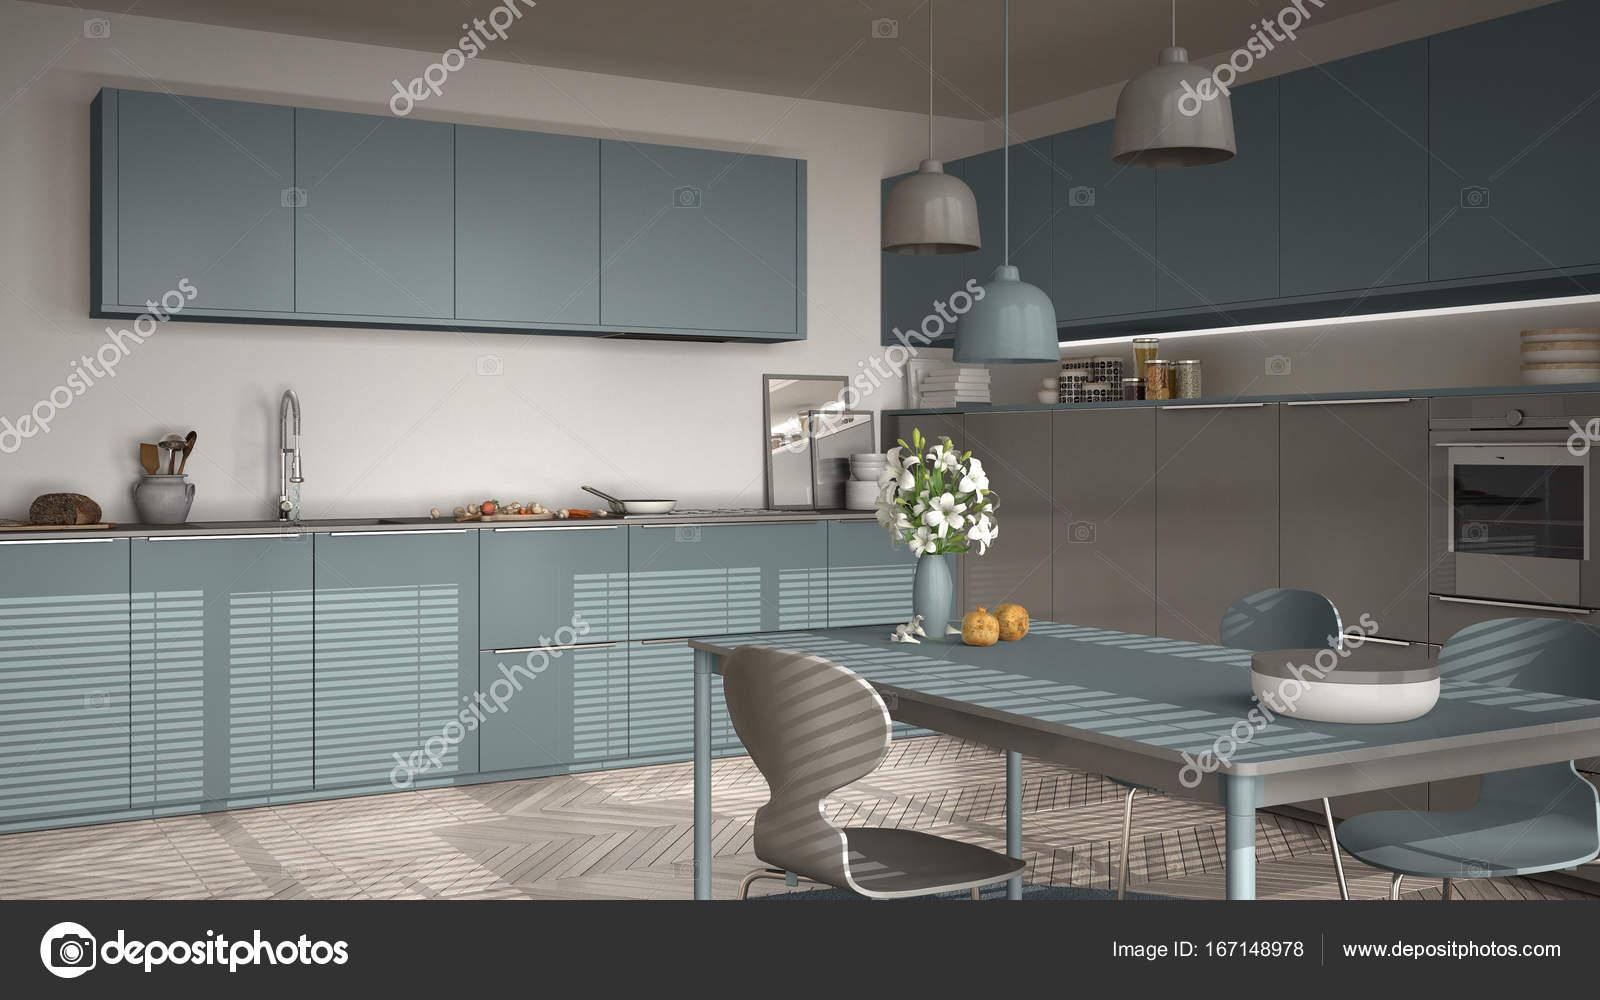 large kitchen table track lighting for 现代厨房的桌子和椅子 大窗户和herringbon 图库照片 c archiviz 167148978